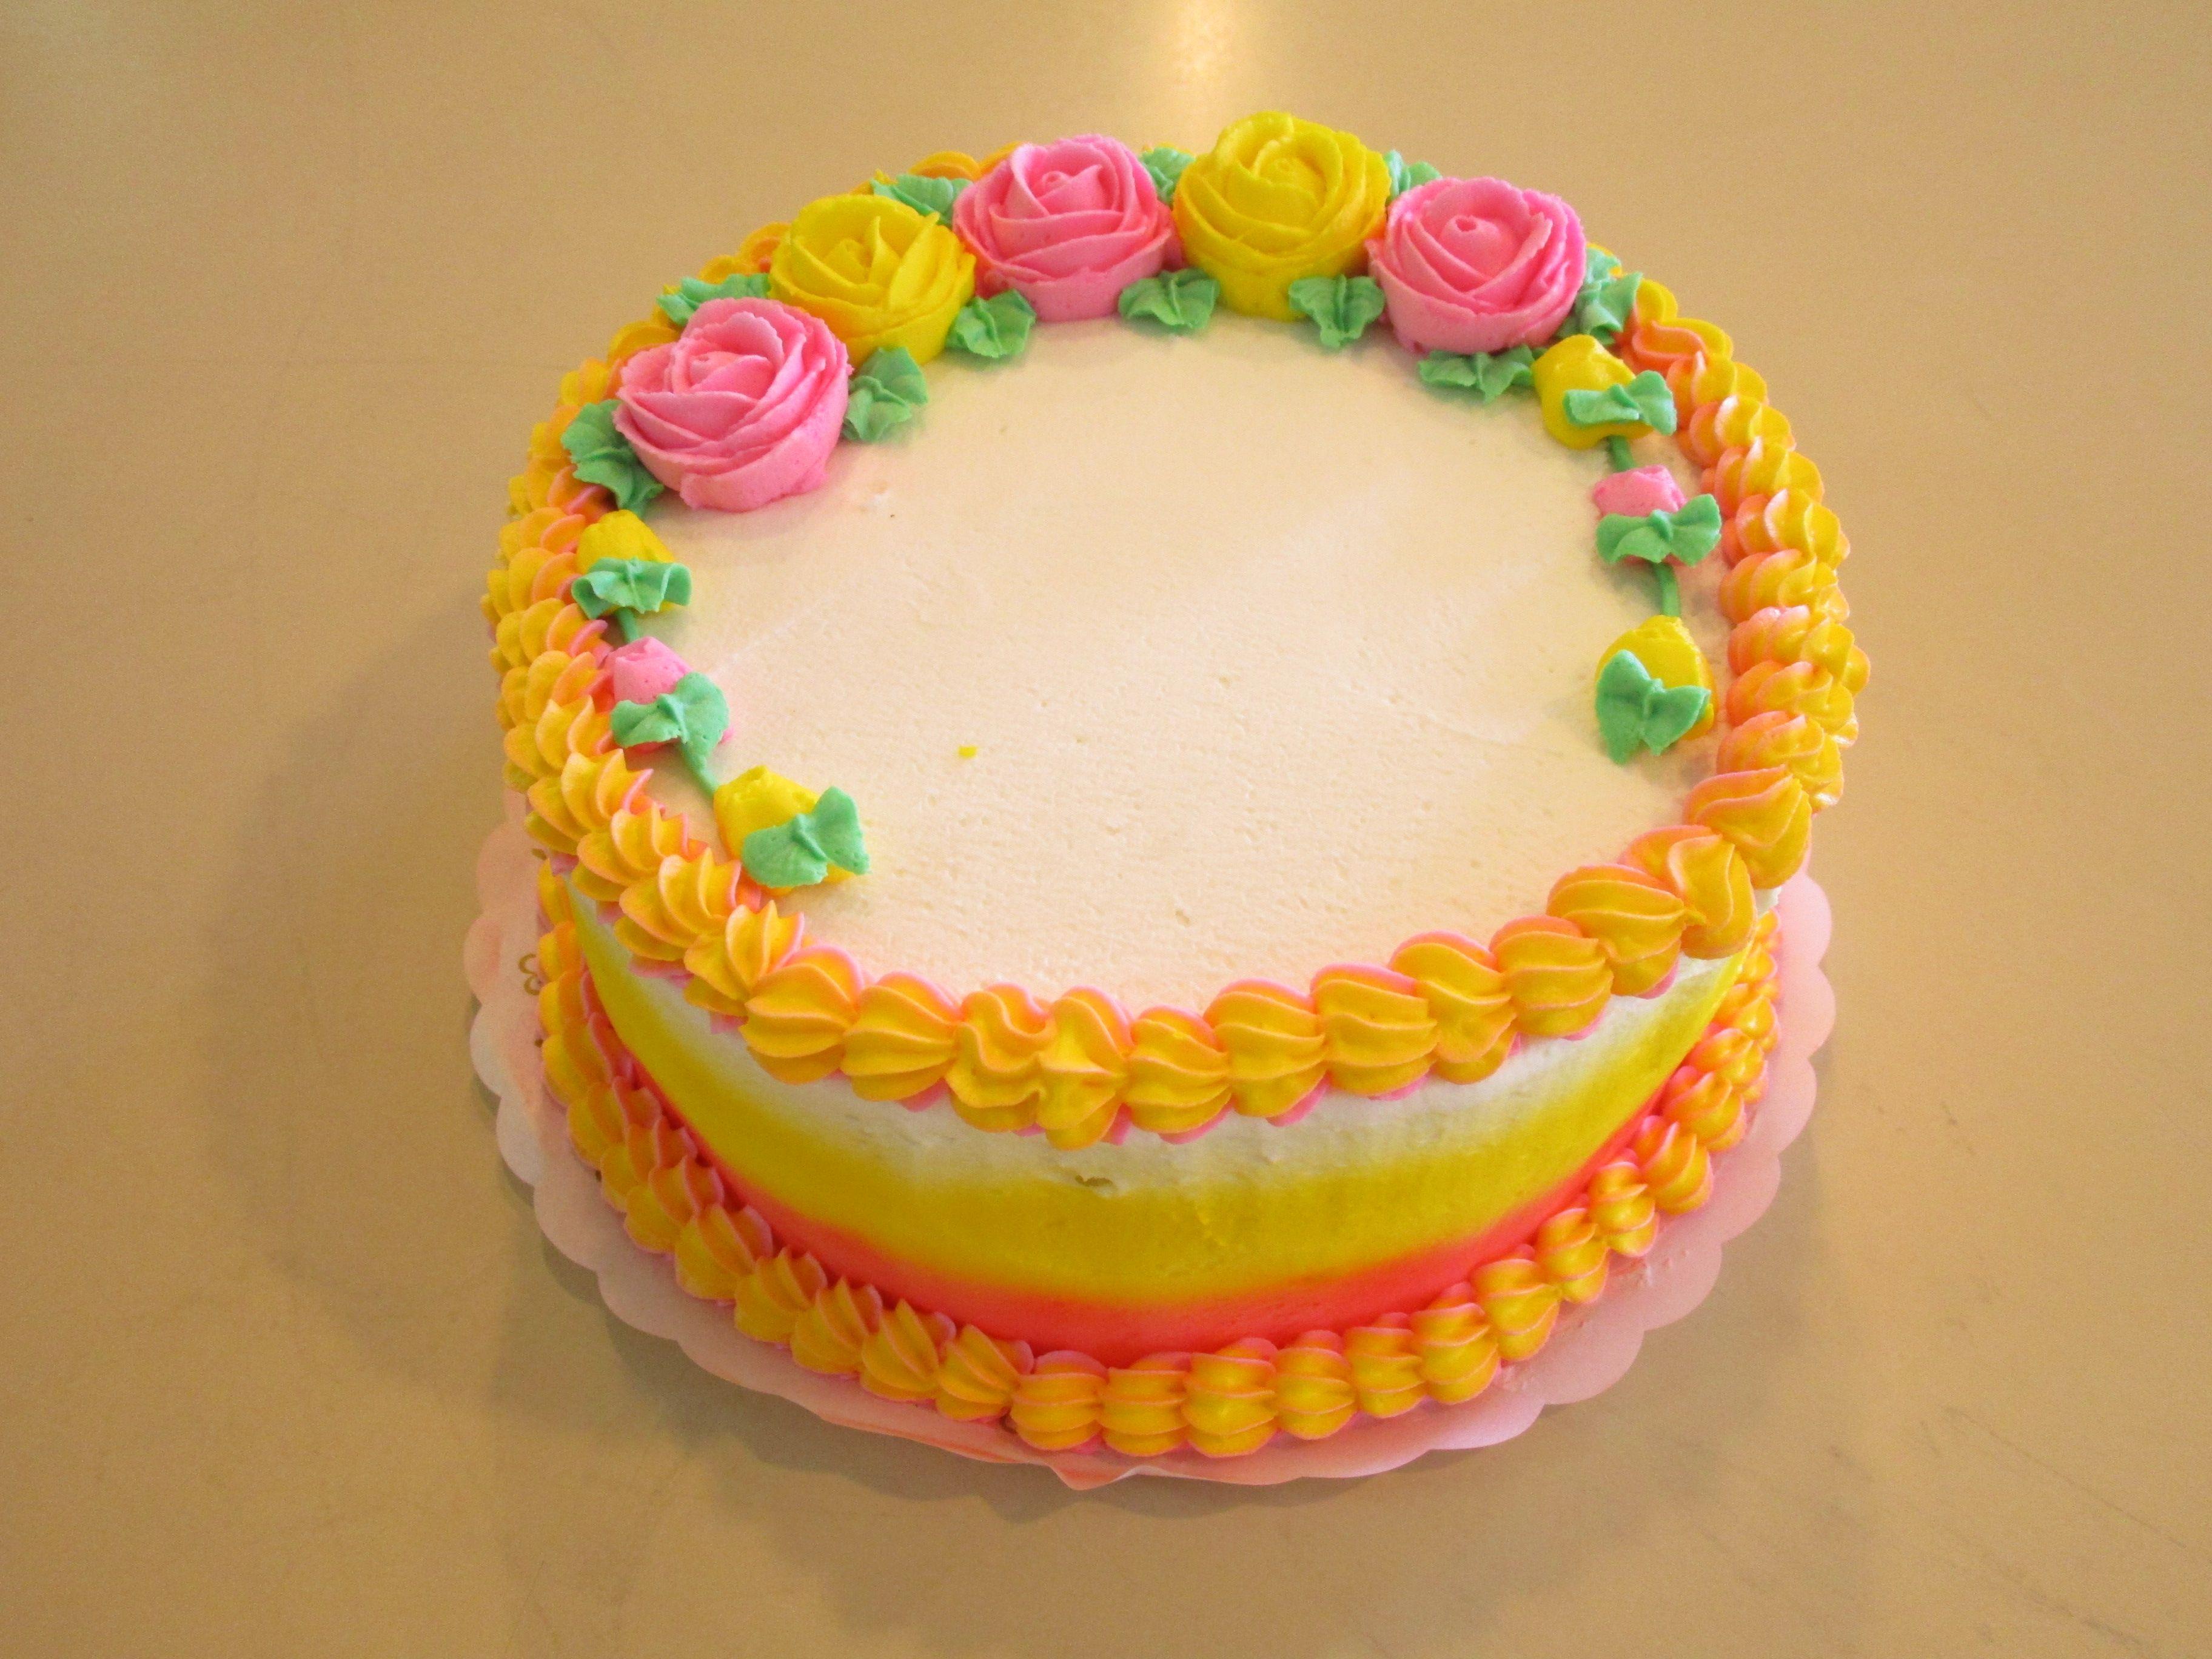 Pink and yellow round cake #wedekingsbakery